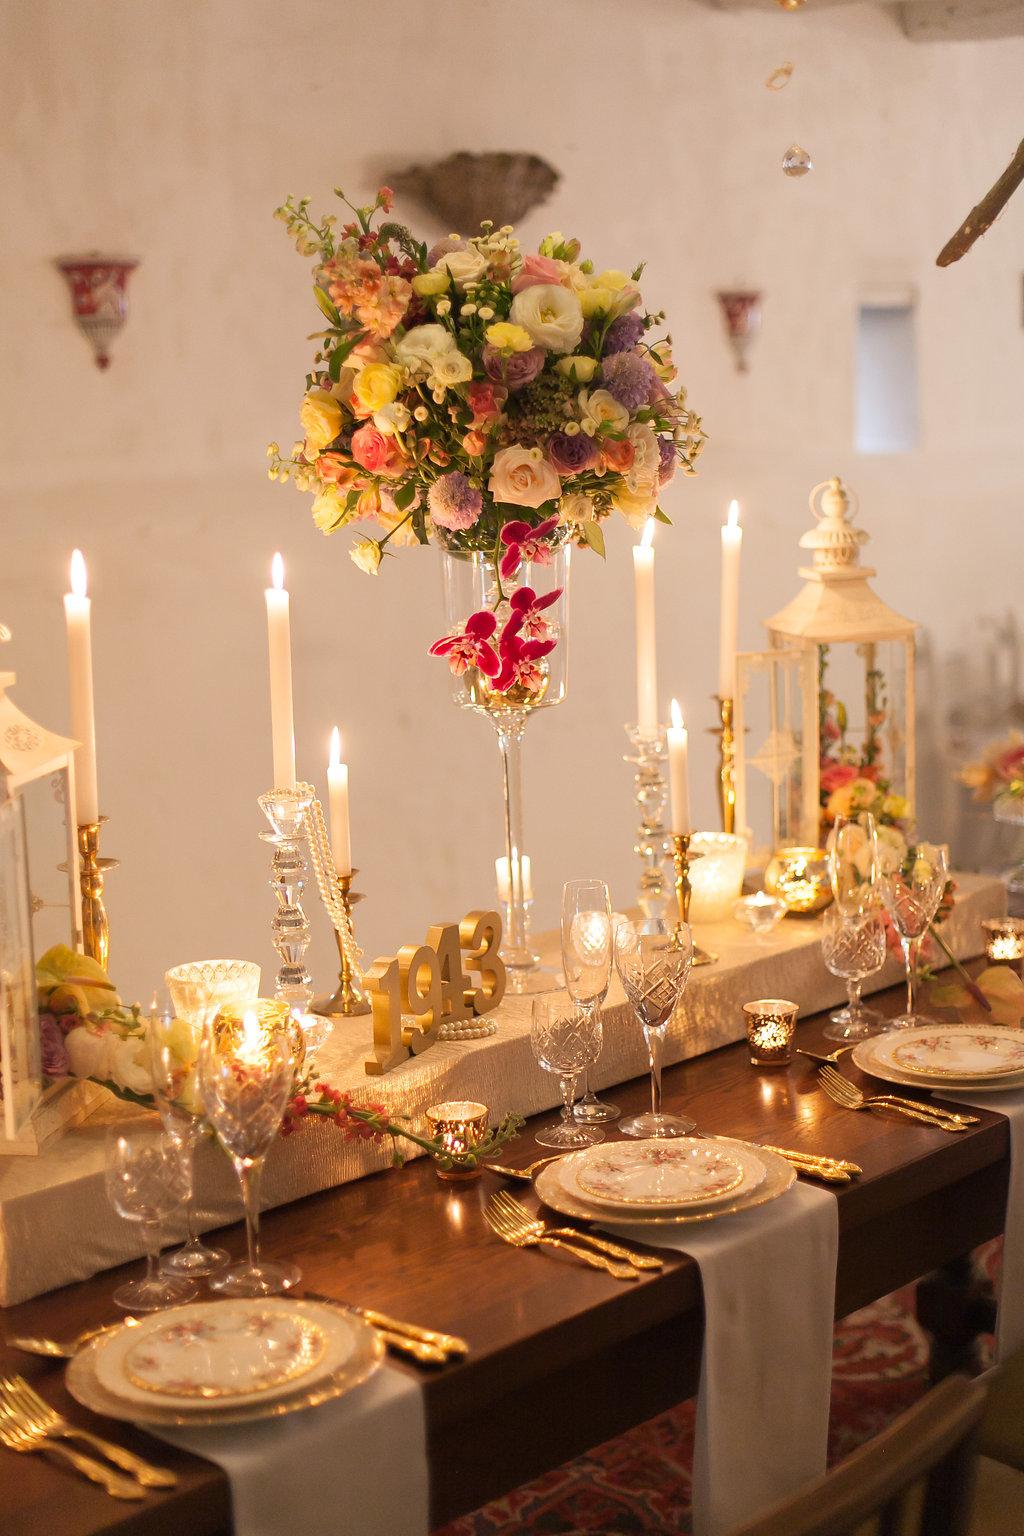 Candlelight Tablescape | Image: Nelani Van Zyl